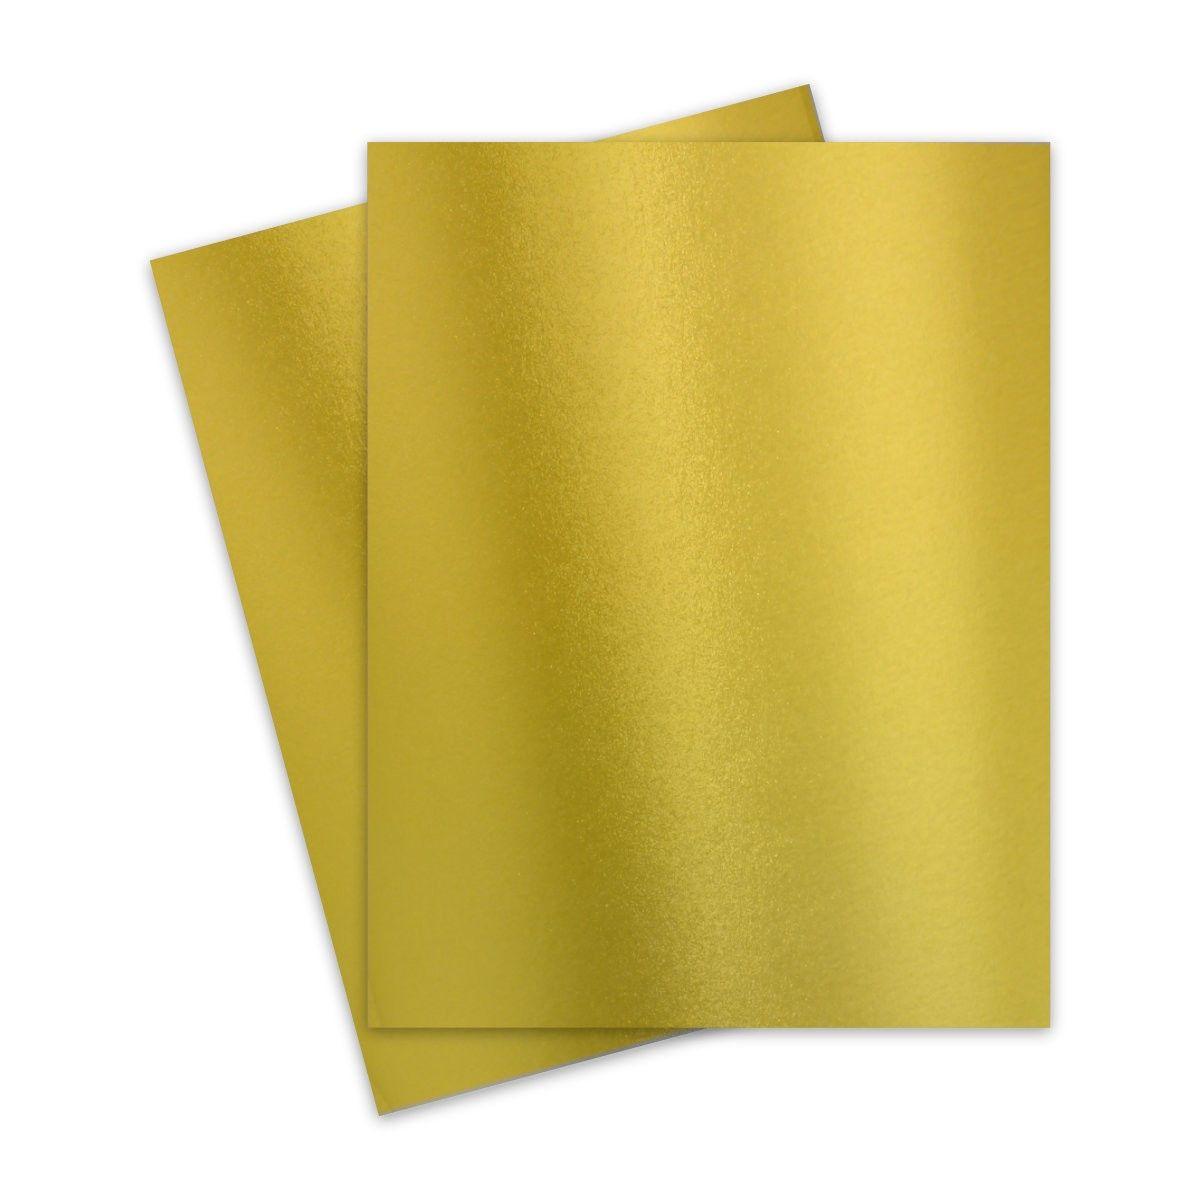 Fav Shimmer Premium Gold 8 5 X 11 Card Stock Paper 92lb Cover 250gsm 25 Pk In 2021 Metallic Paper Cardstock Paper Paper